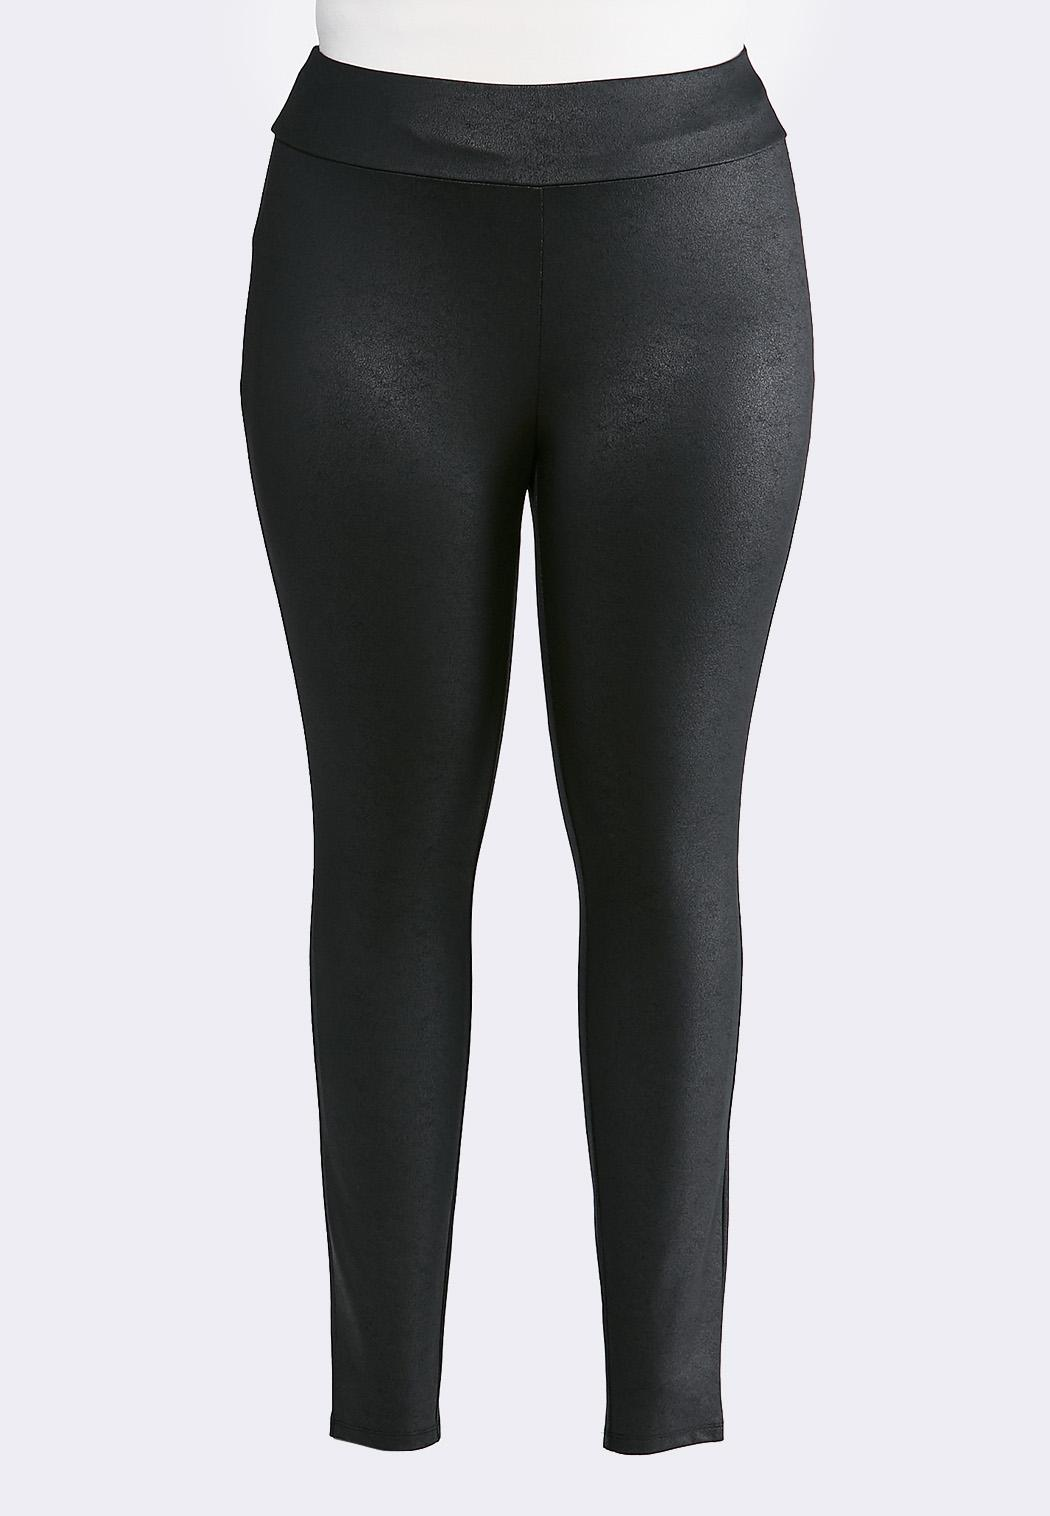 Plus Size Black Coated Leggings